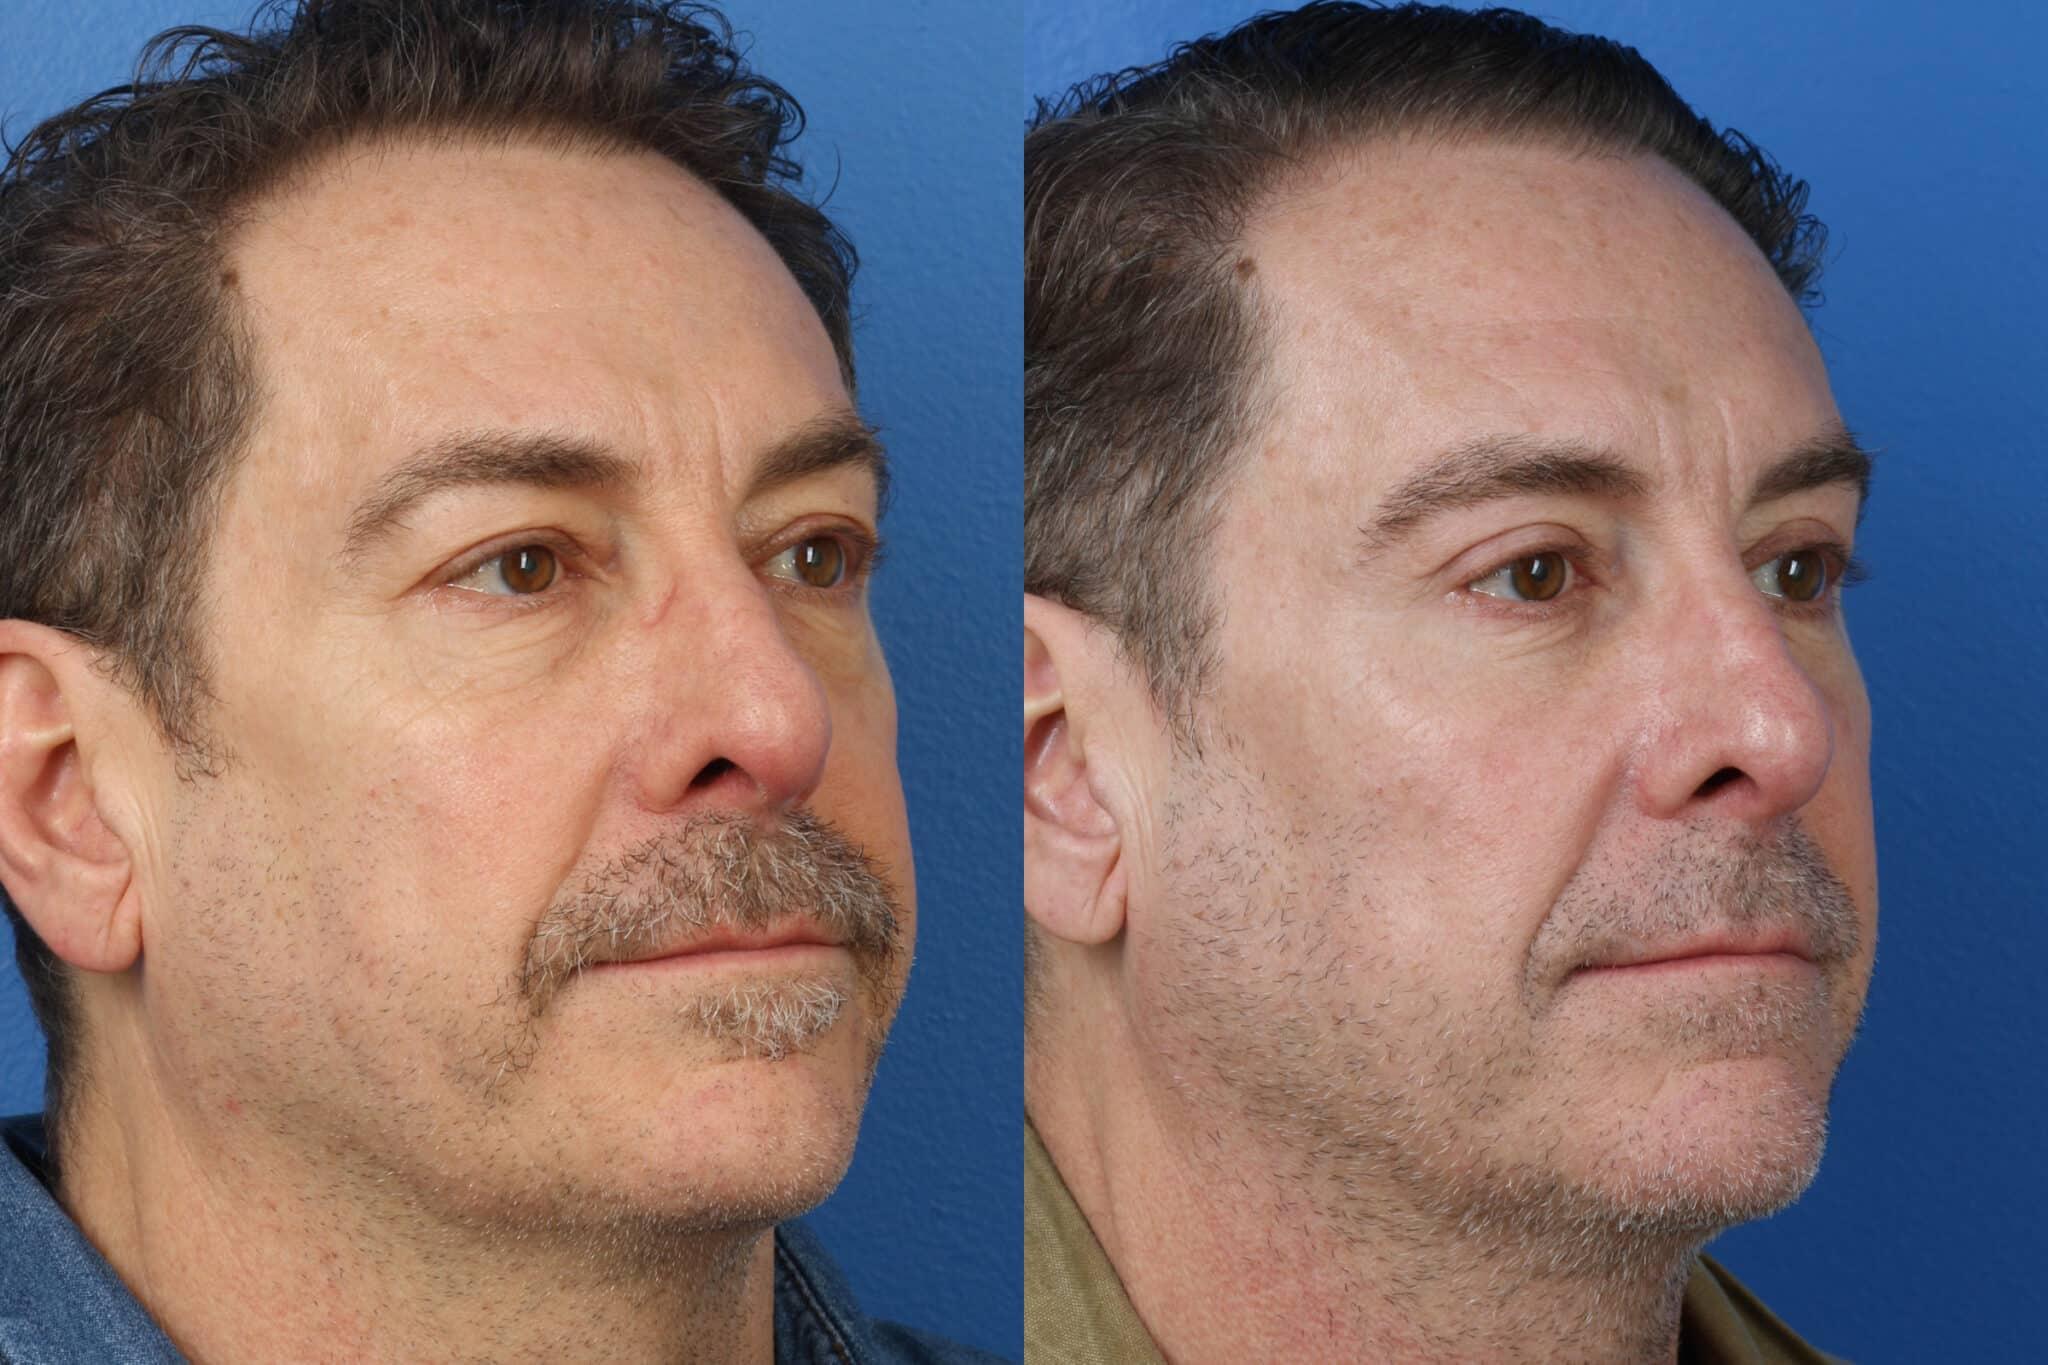 Upper and Lower Blepharoplasty to Rejuvenate Aging Eyes by Dr. Miller